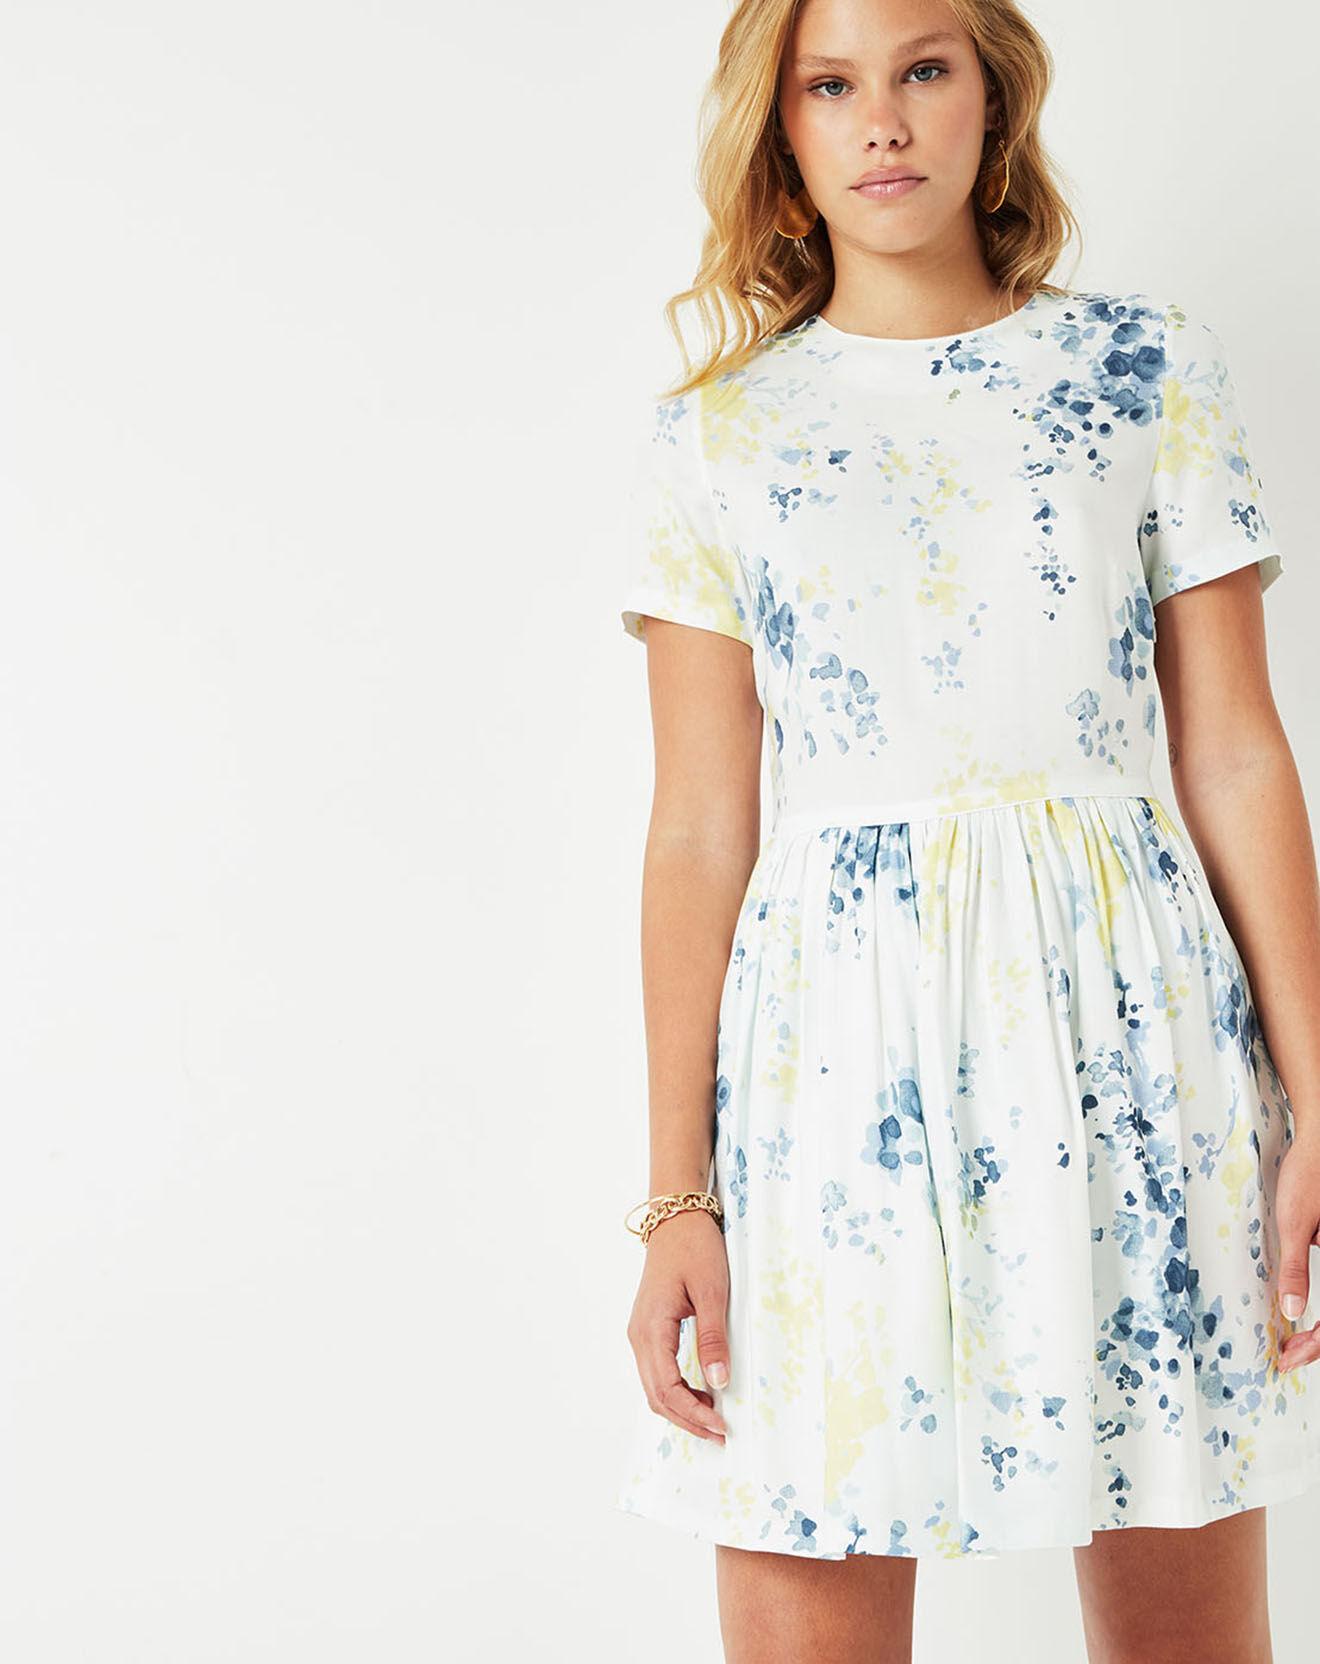 Robe Calme fleurie écru/bleu/jaune - Cuisse de Grenouille - Modalova